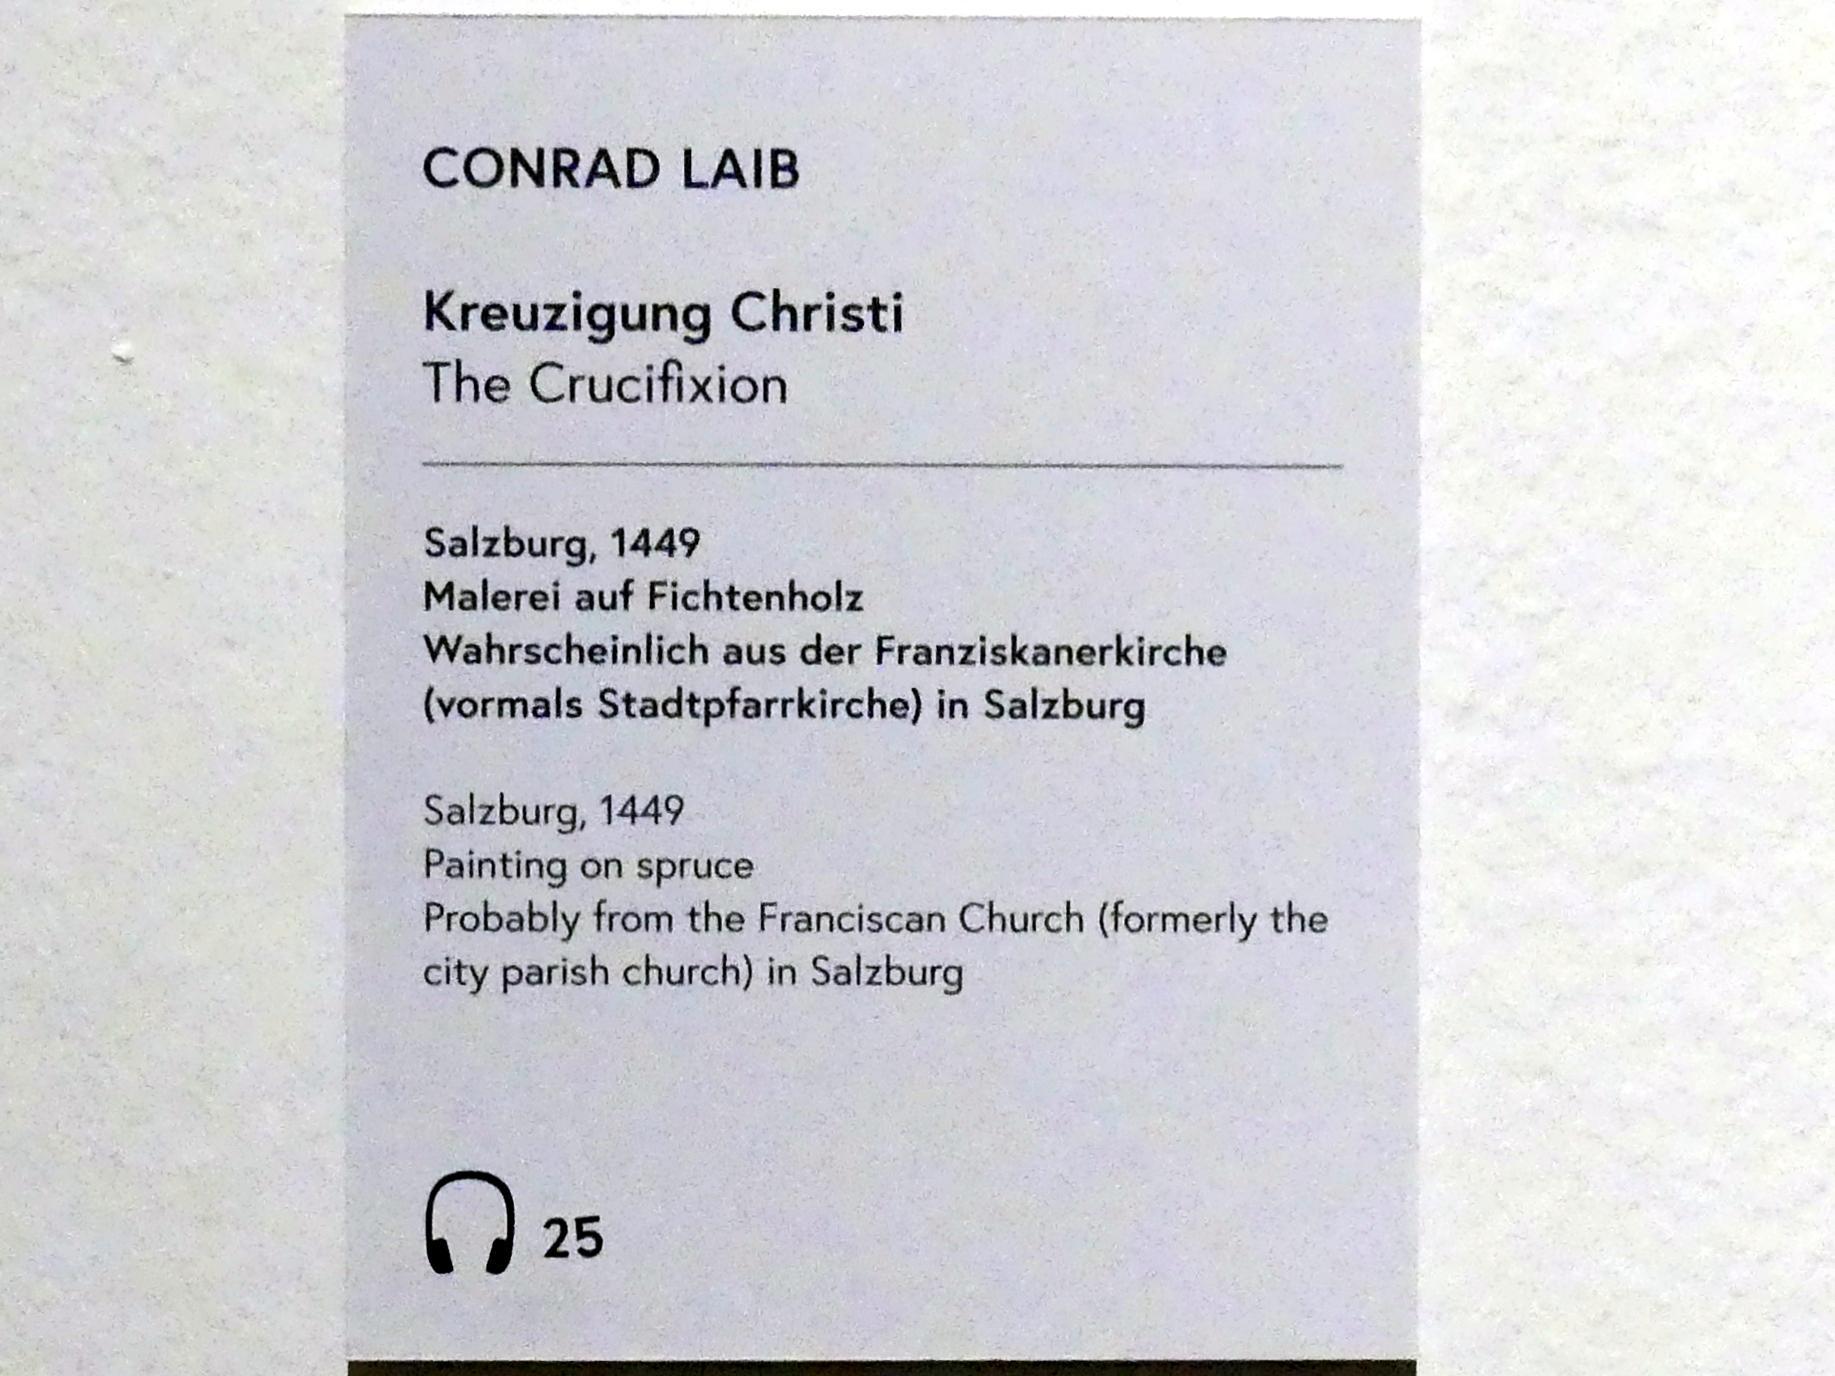 Conrad Laib: Kreuzigung Christi, 1449